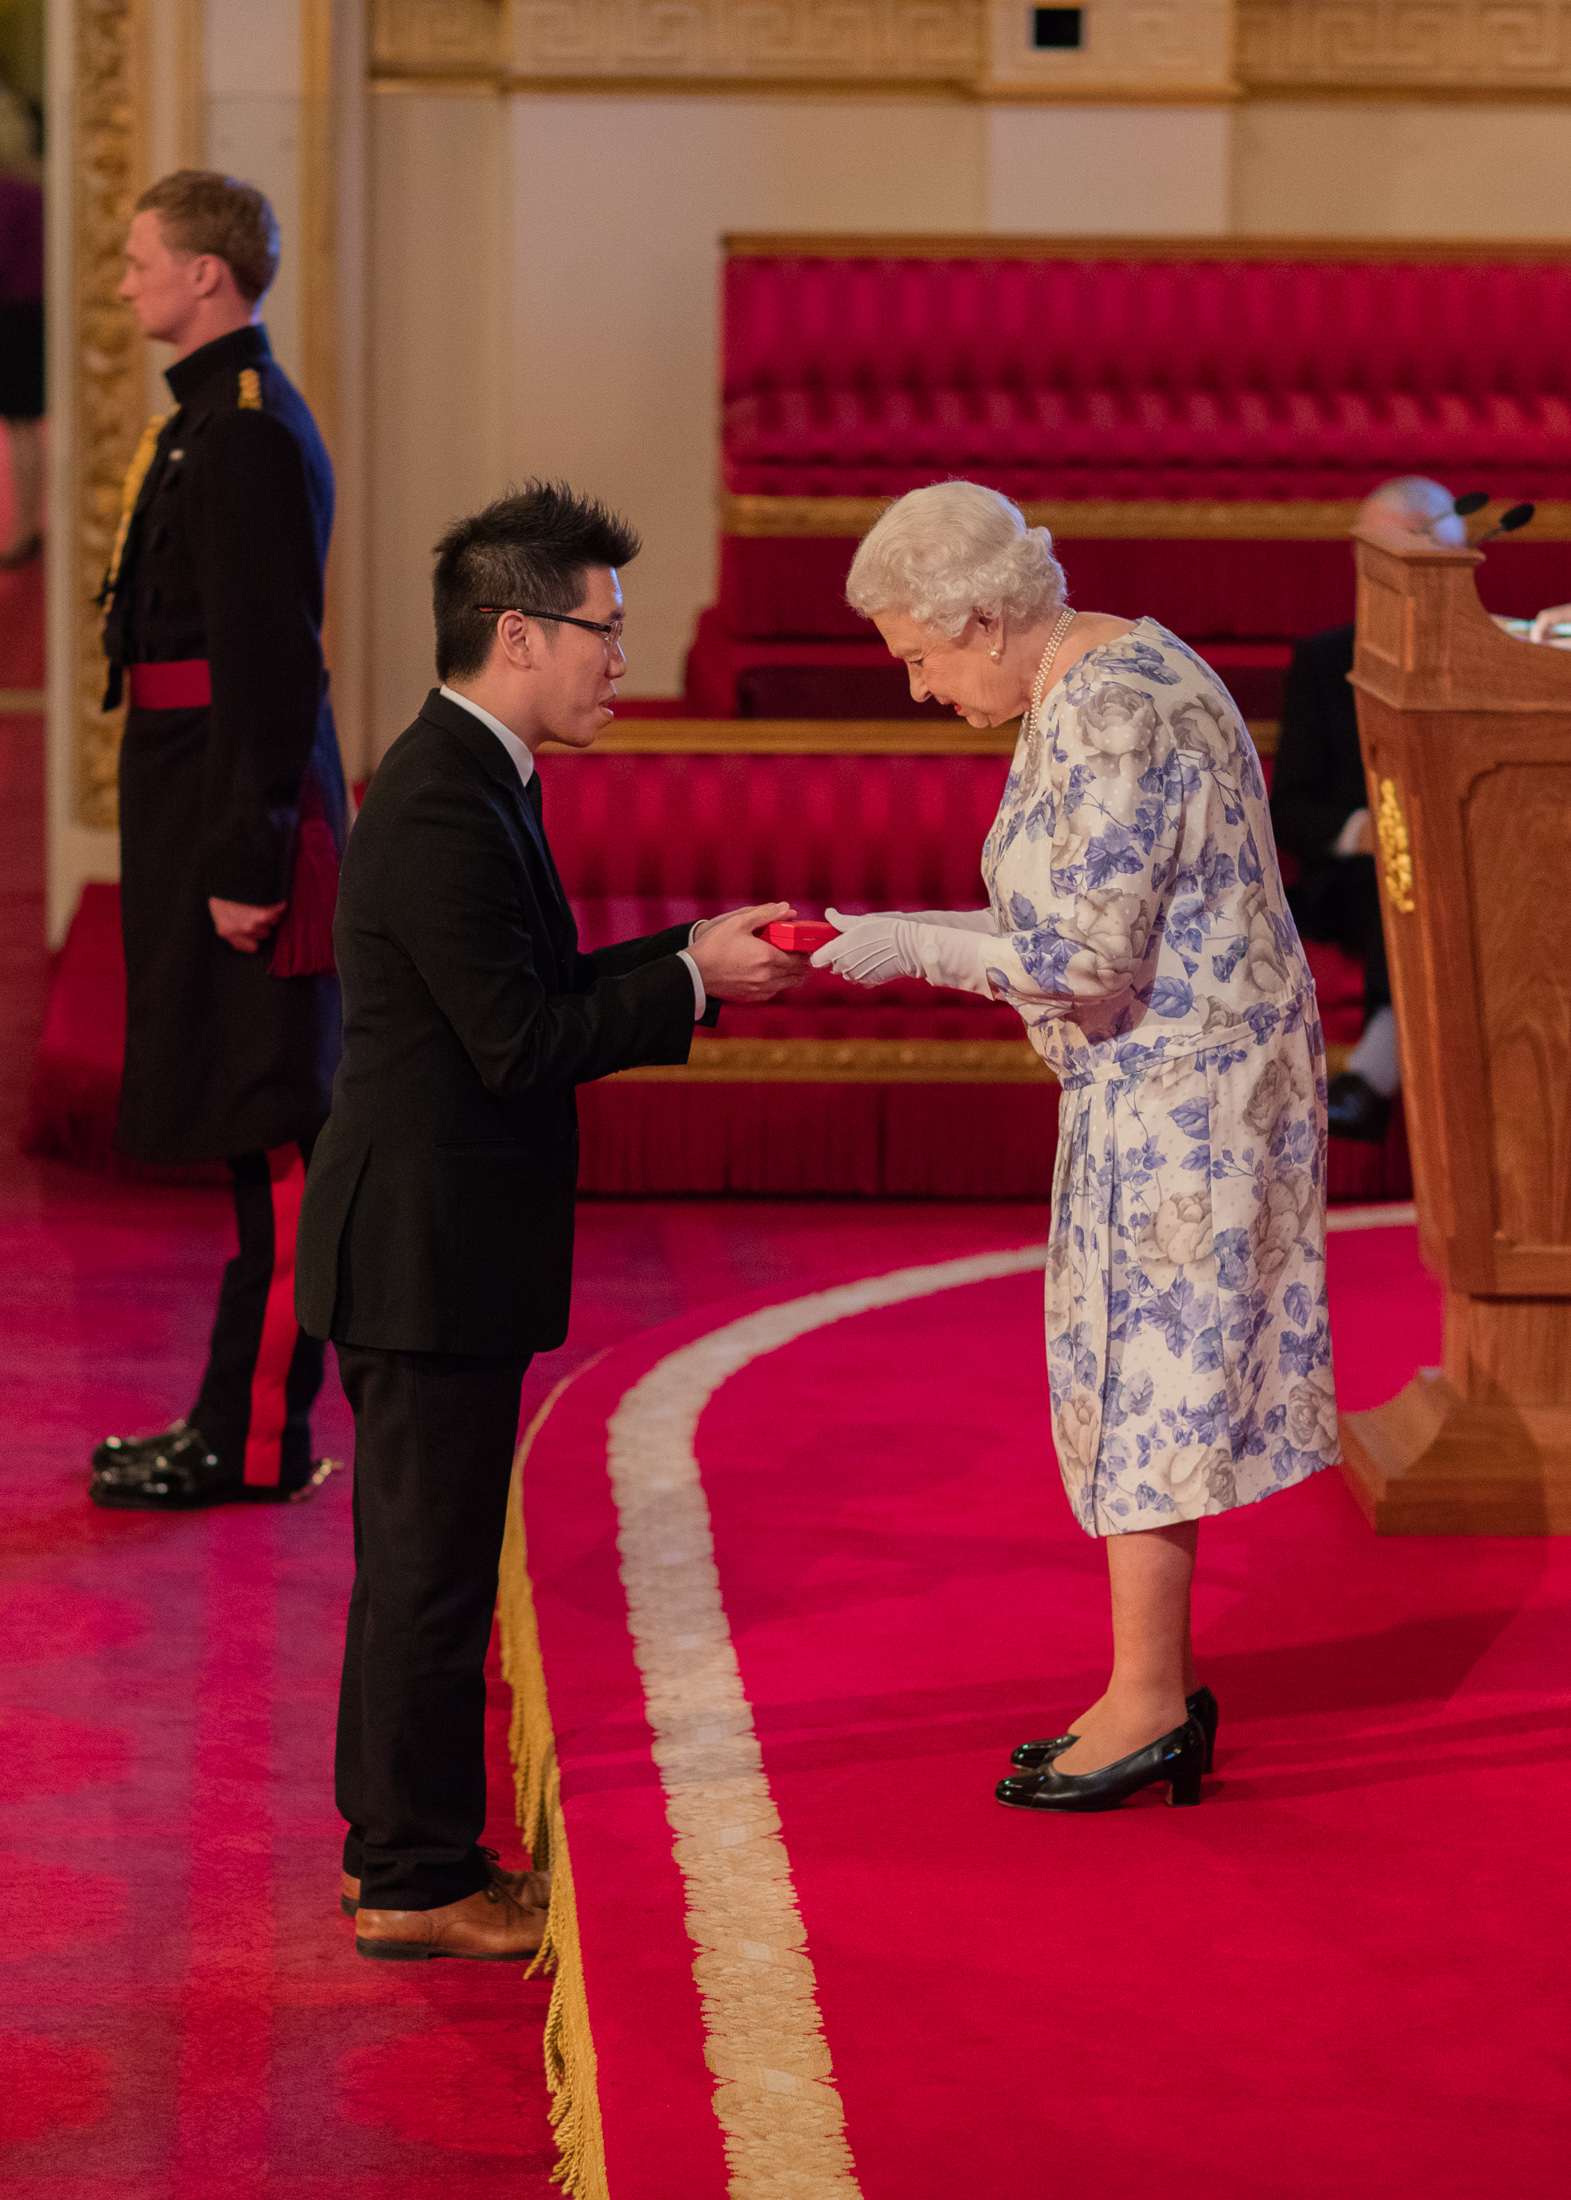 Mark Jin Quan Cheng 2016 Queen's Young Leaders